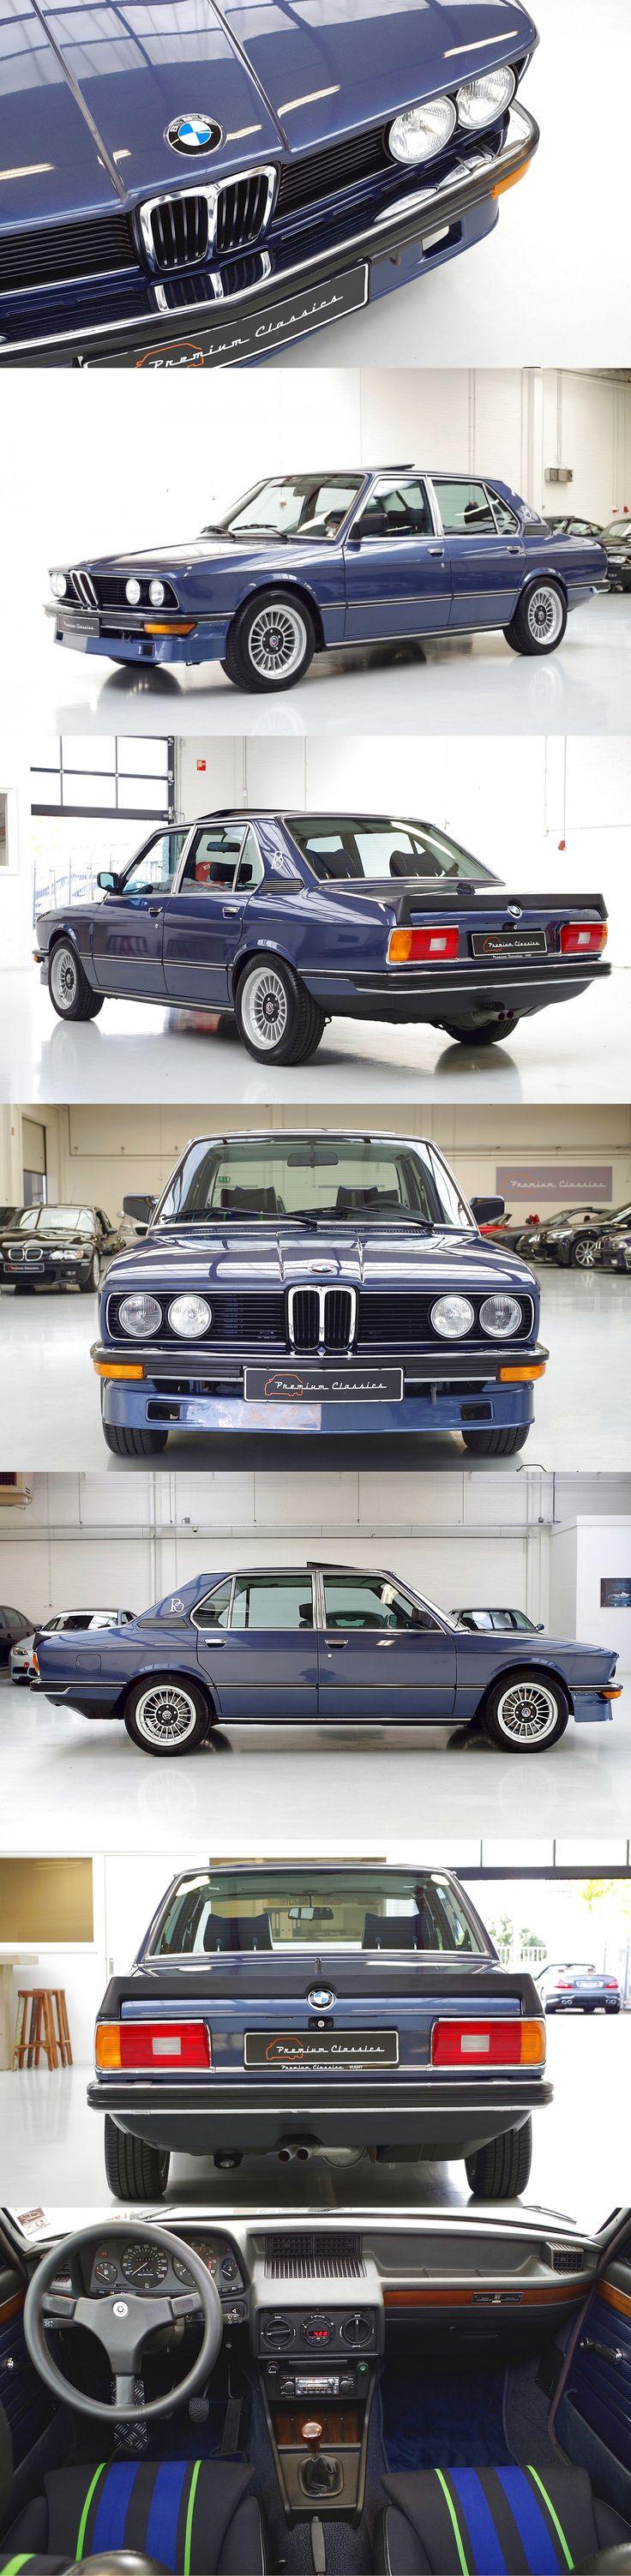 1980 BMW 528i / E12 / blue / Germany / premiumclassics.nl / 17-413 http://krro.com.mx/